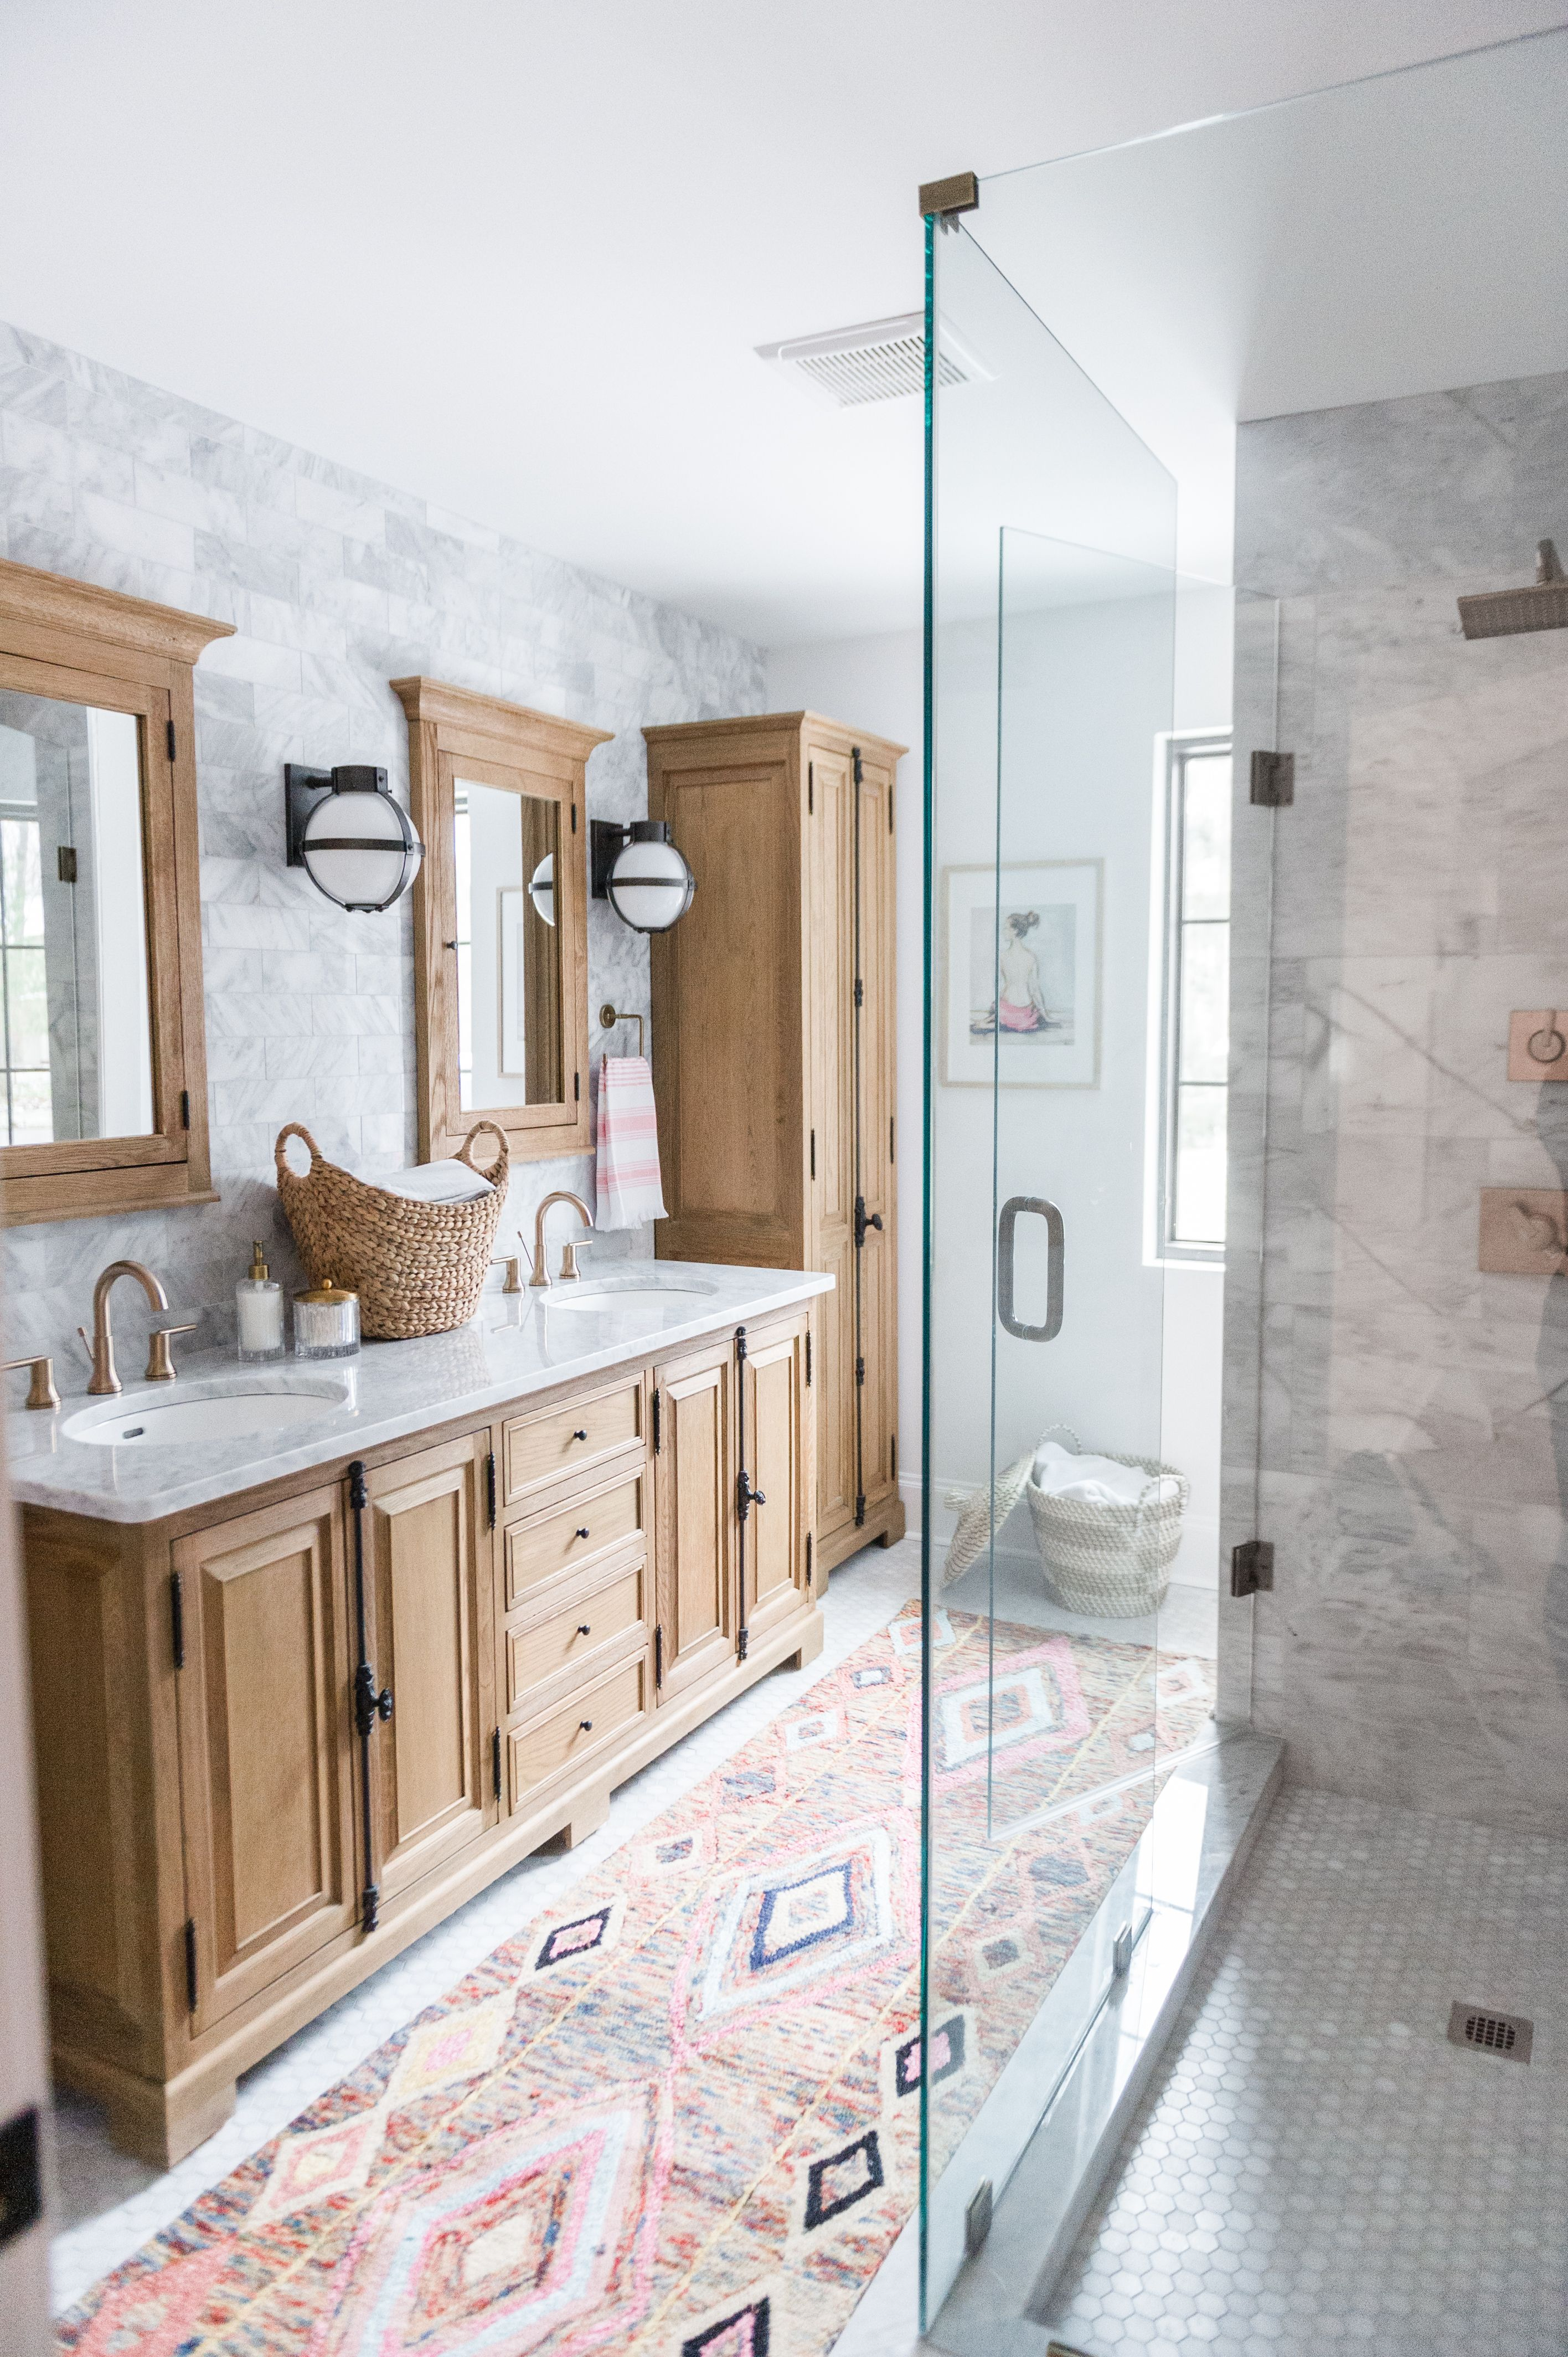 Modern Boho Bathroom Renovation Reveal With Rugs USAs Berber Moroccan SM17 Runner